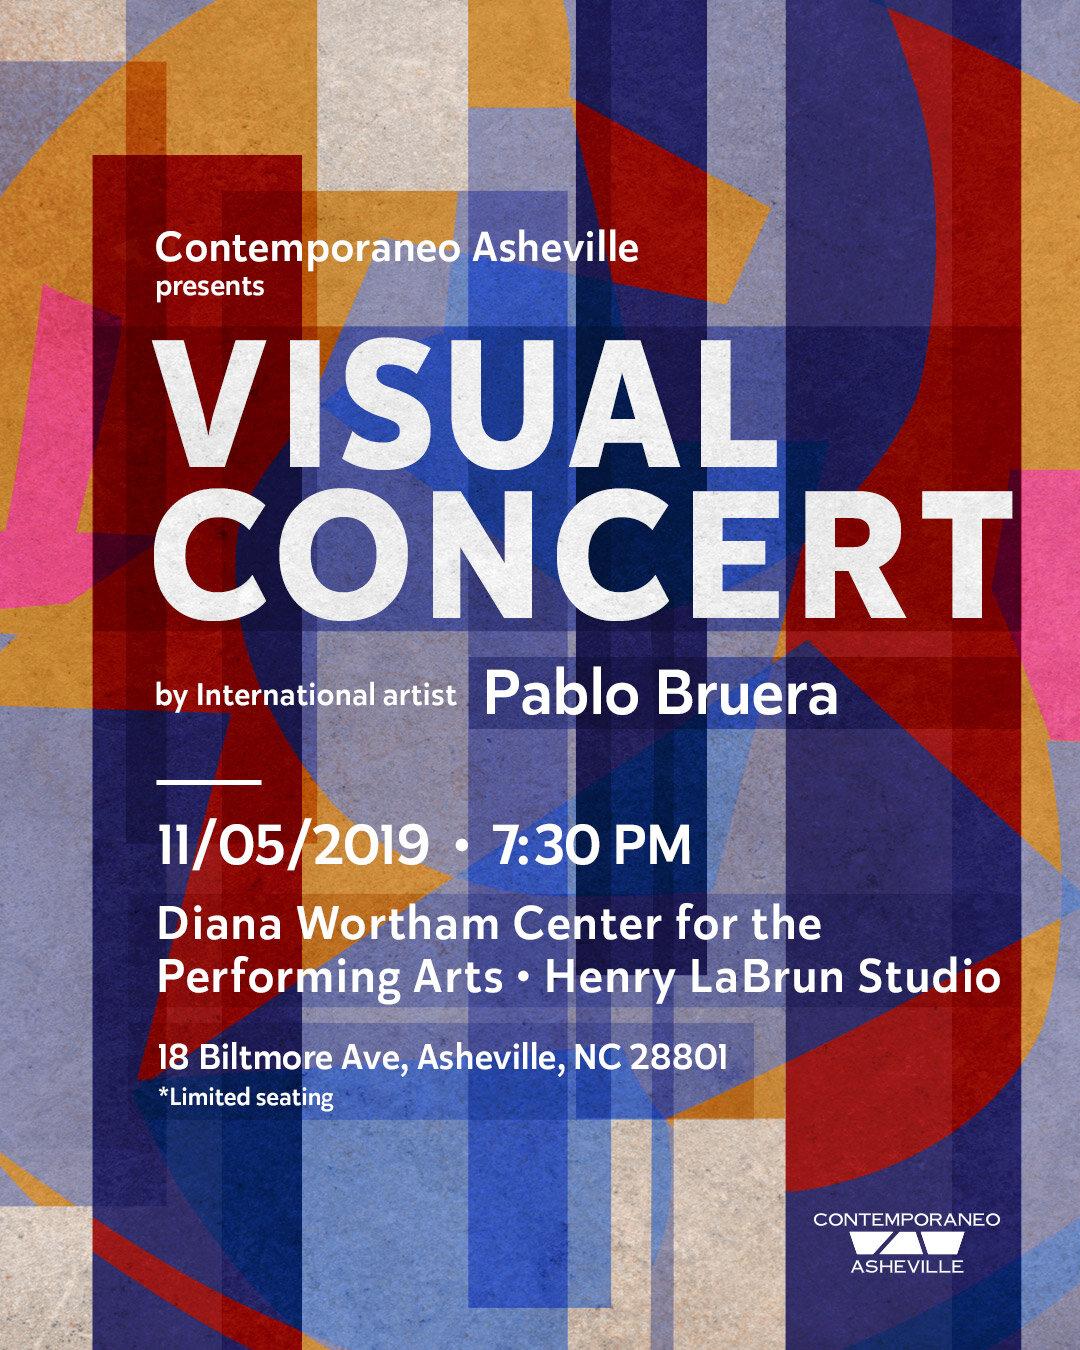 PabloBruera-1080x1350-web.jpg